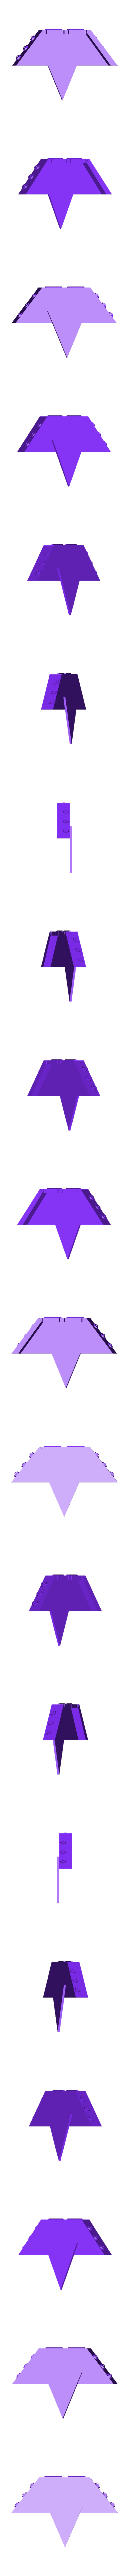 rear_platform_with_connector.stl Télécharger fichier STL gratuit Ork Great Gargant 6mm Epic Scale Proxy model • Objet à imprimer en 3D, redstarkits